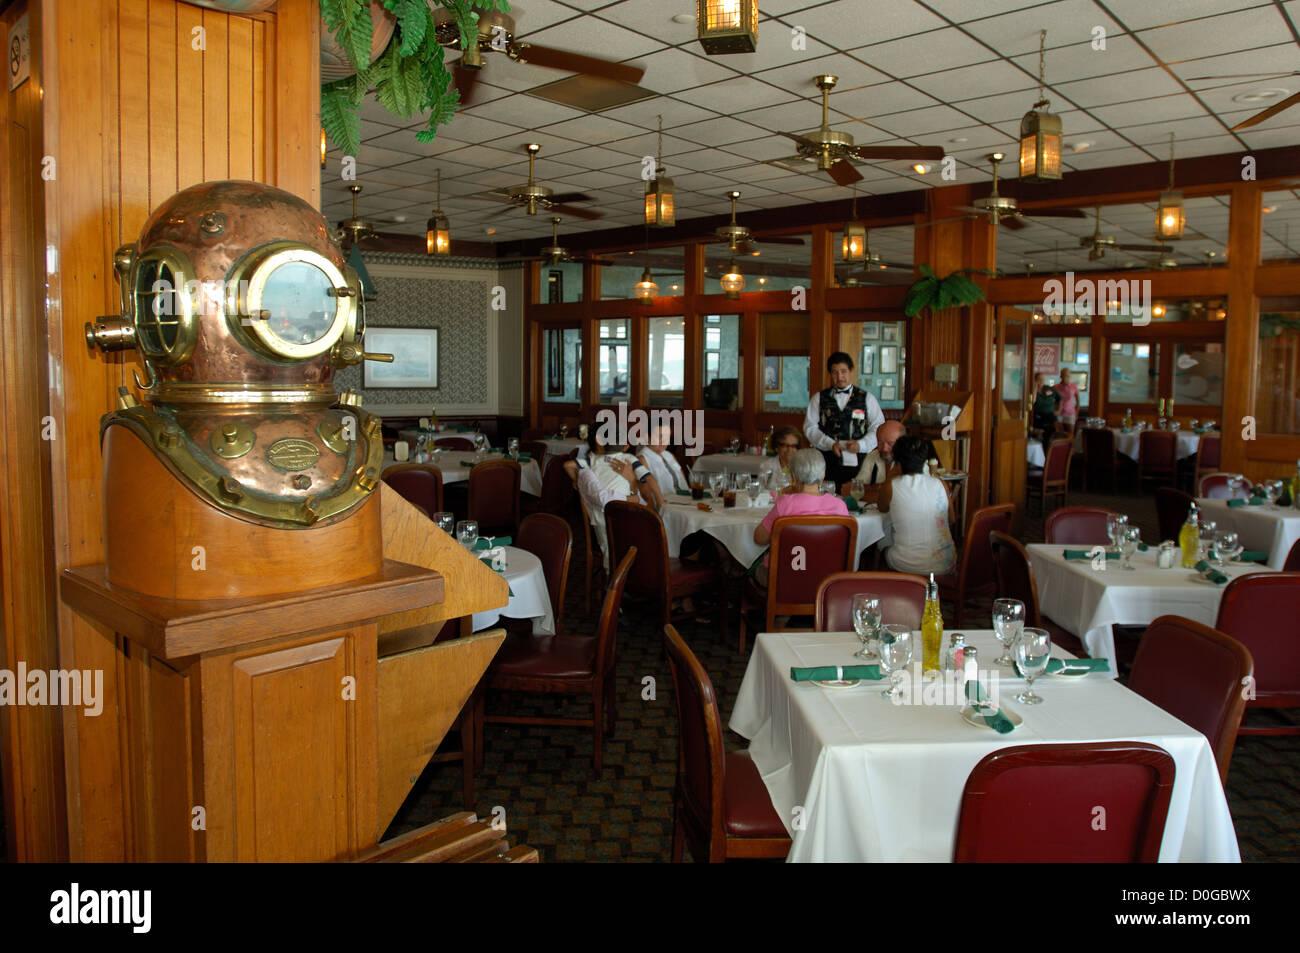 Dining Room At Gaido S Seafood Restaurant In Galveston Texas